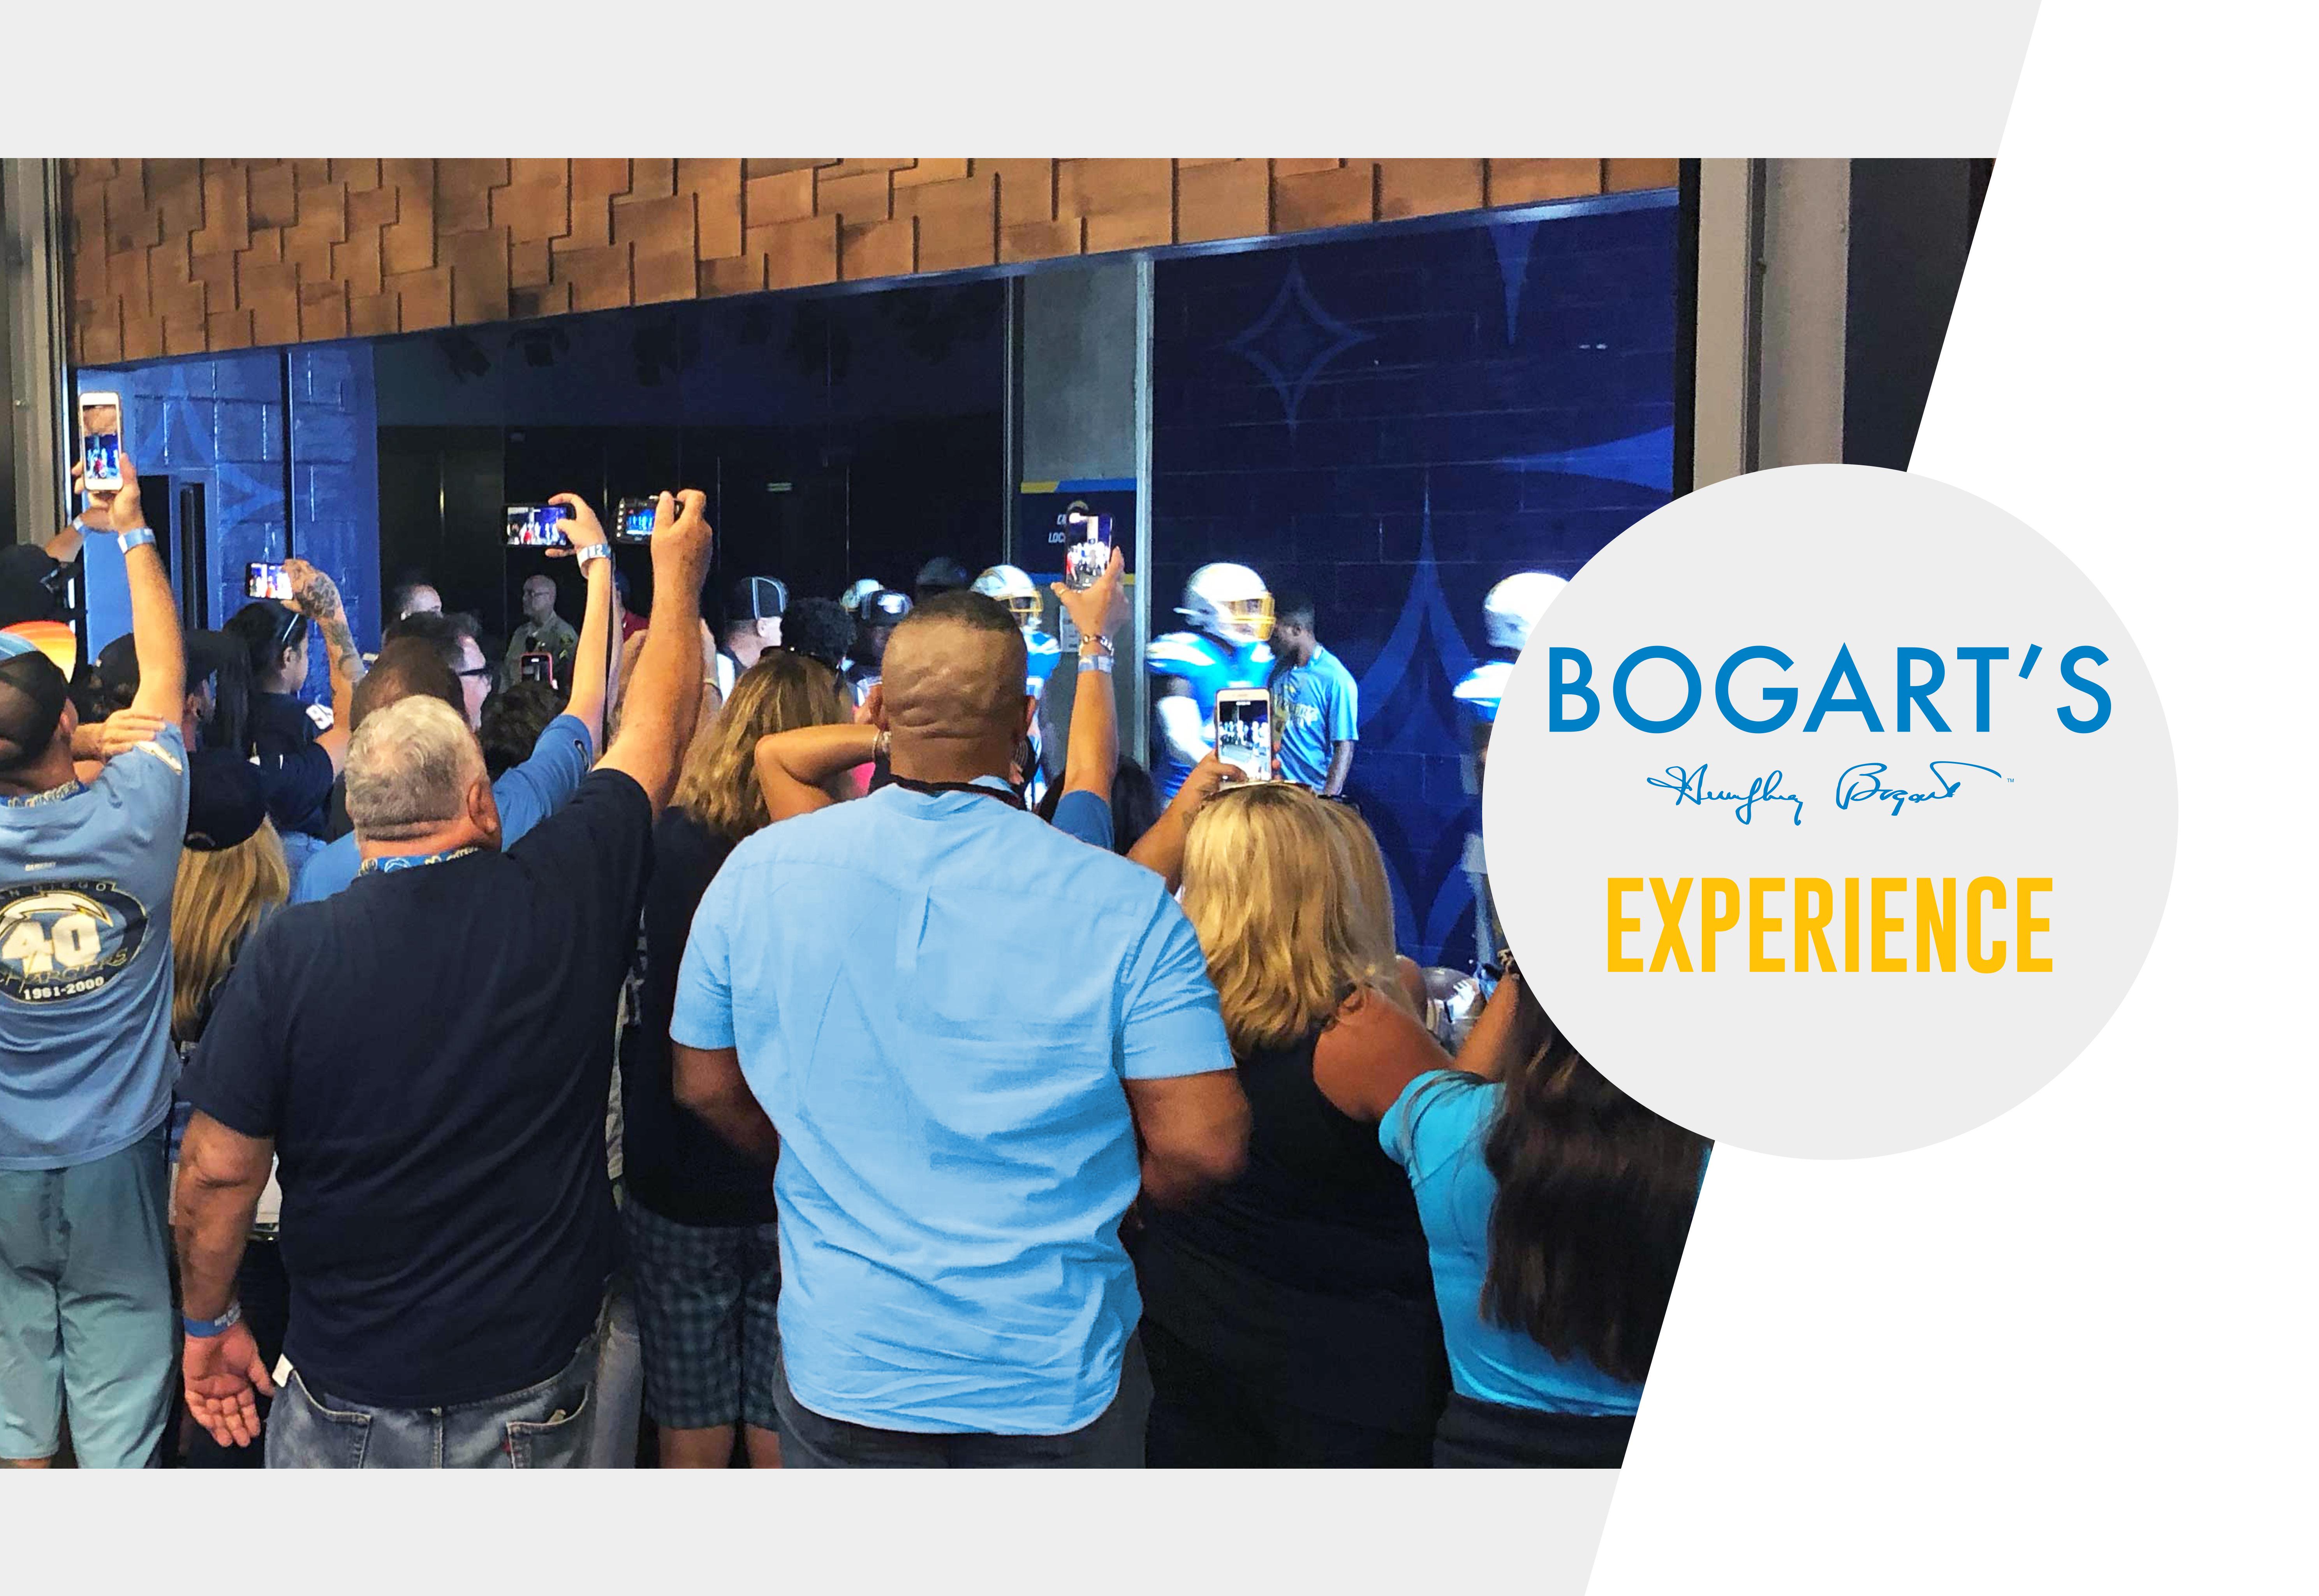 Bogart's Experience